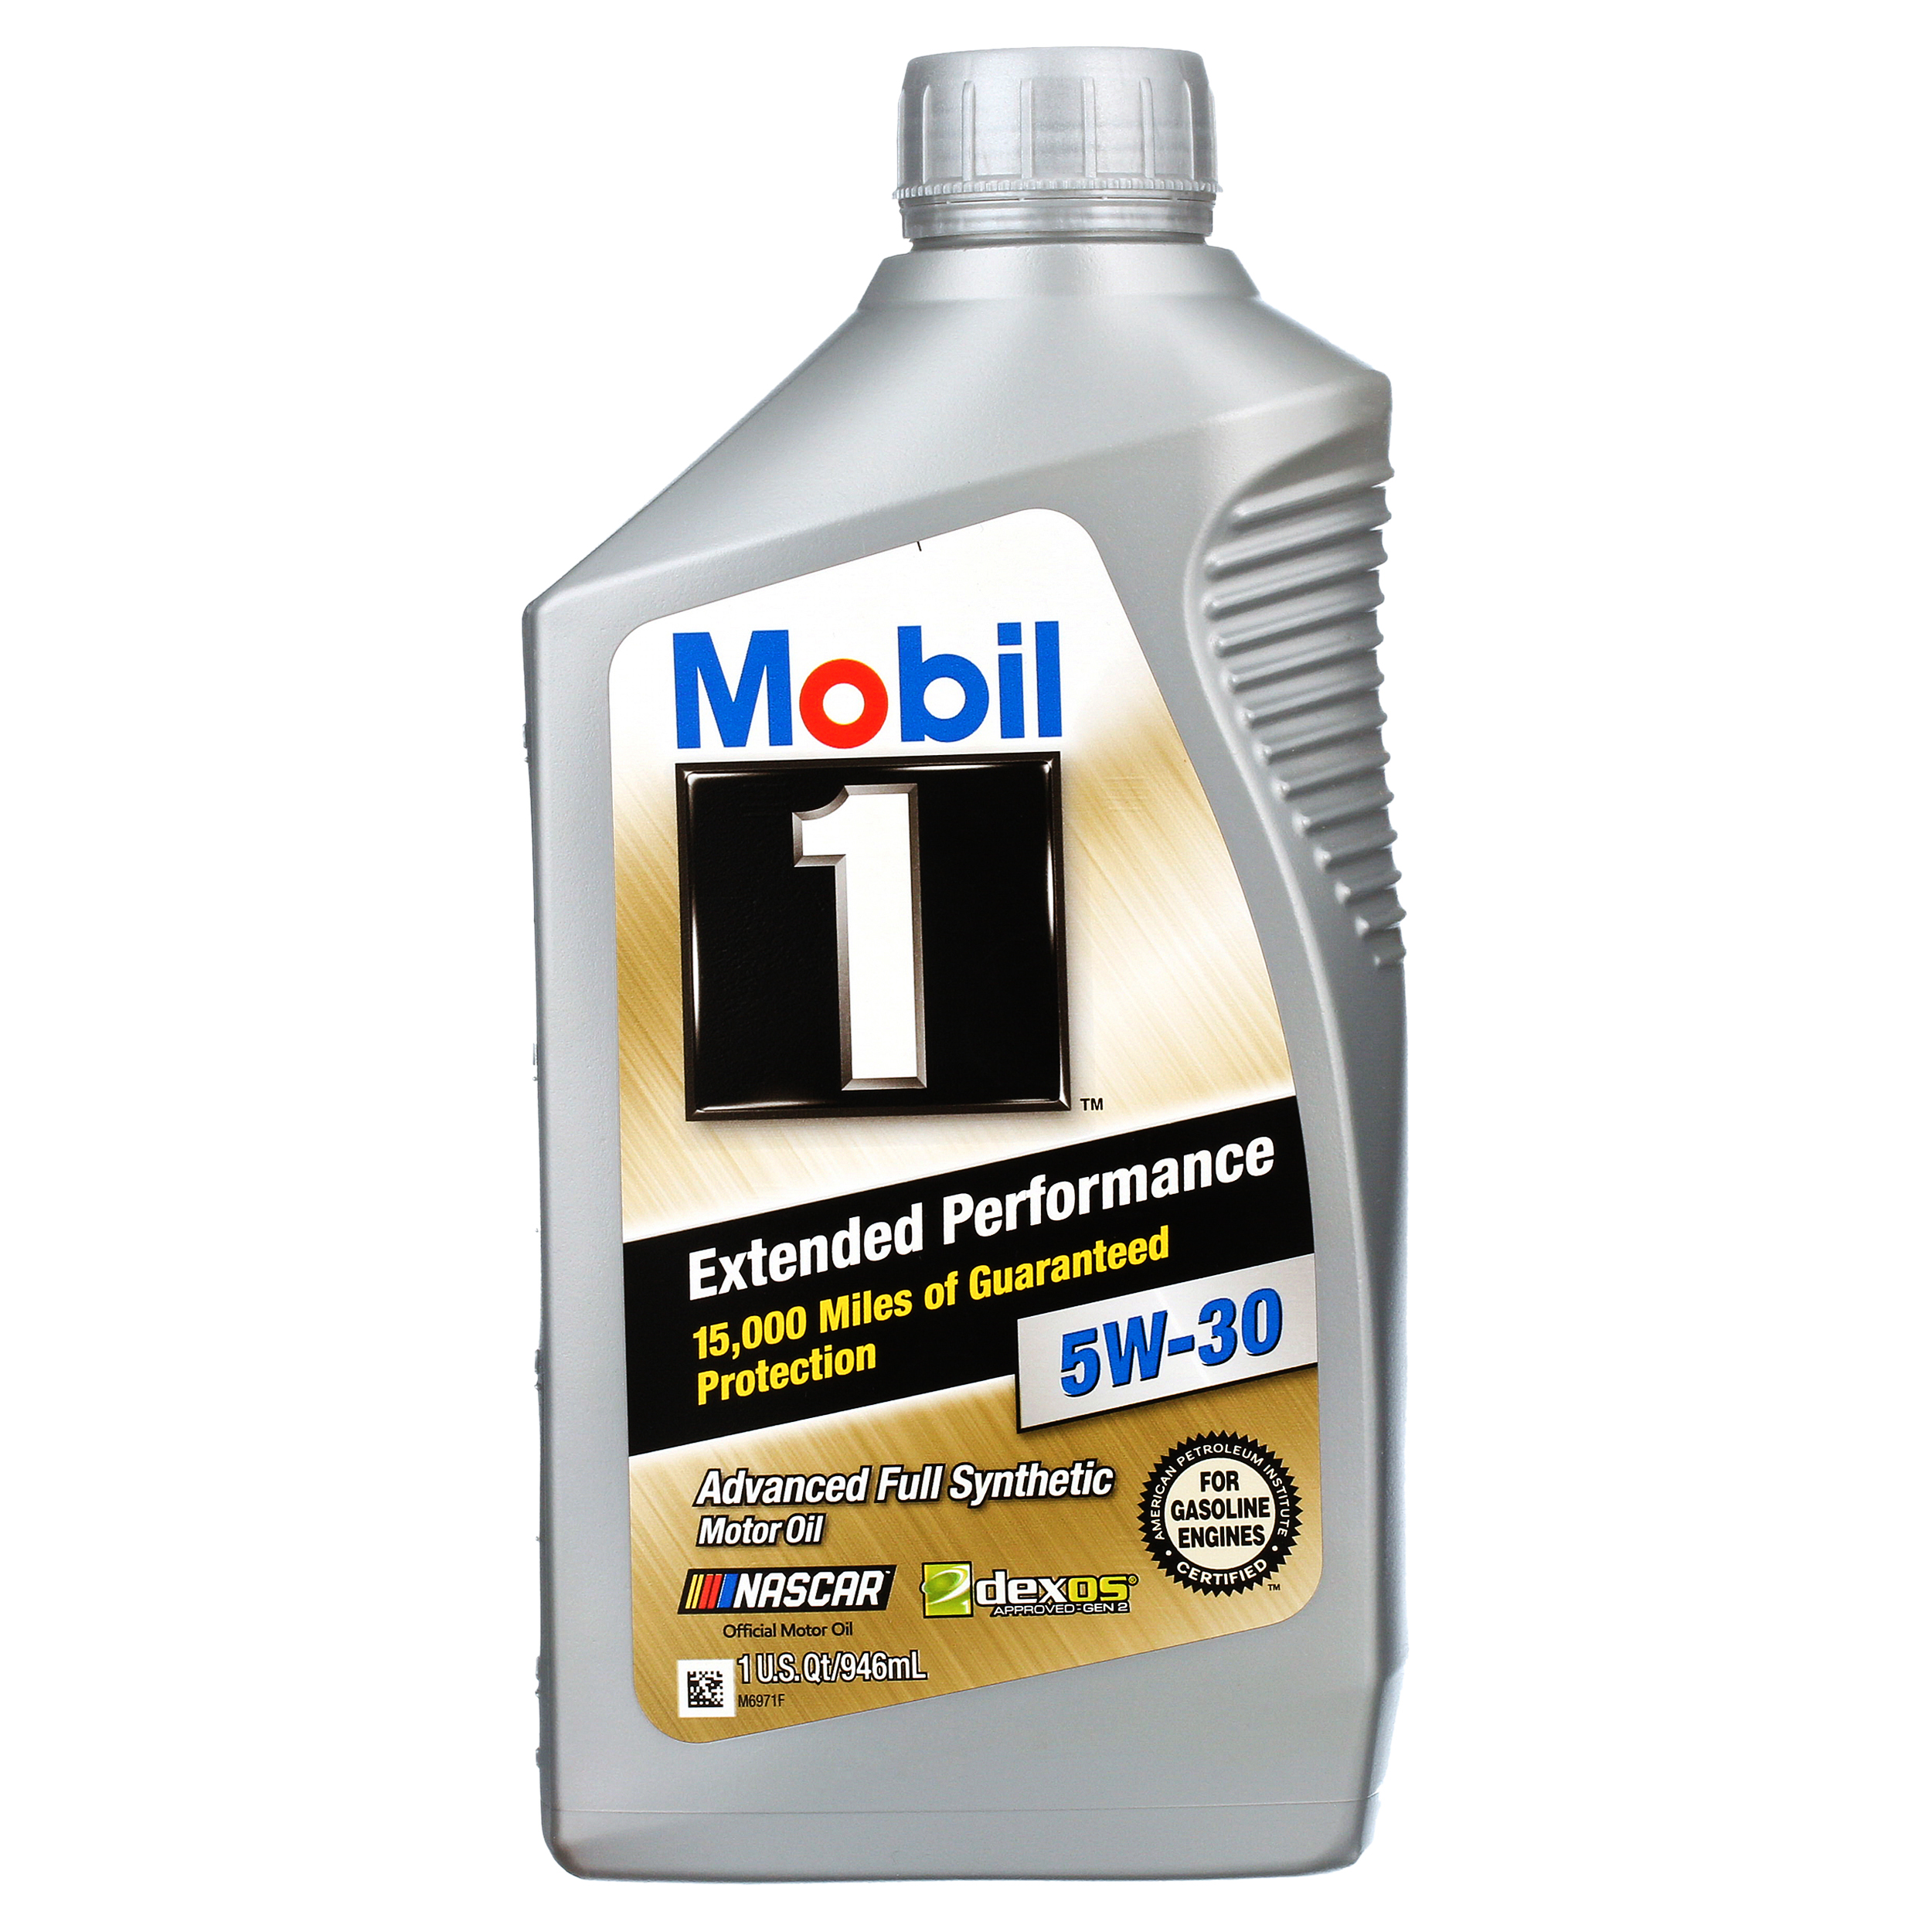 Mobil 1 Extended Performance Full Synthetic Motor Oil 5w 30 1 Quart Walmart Com Walmart Com